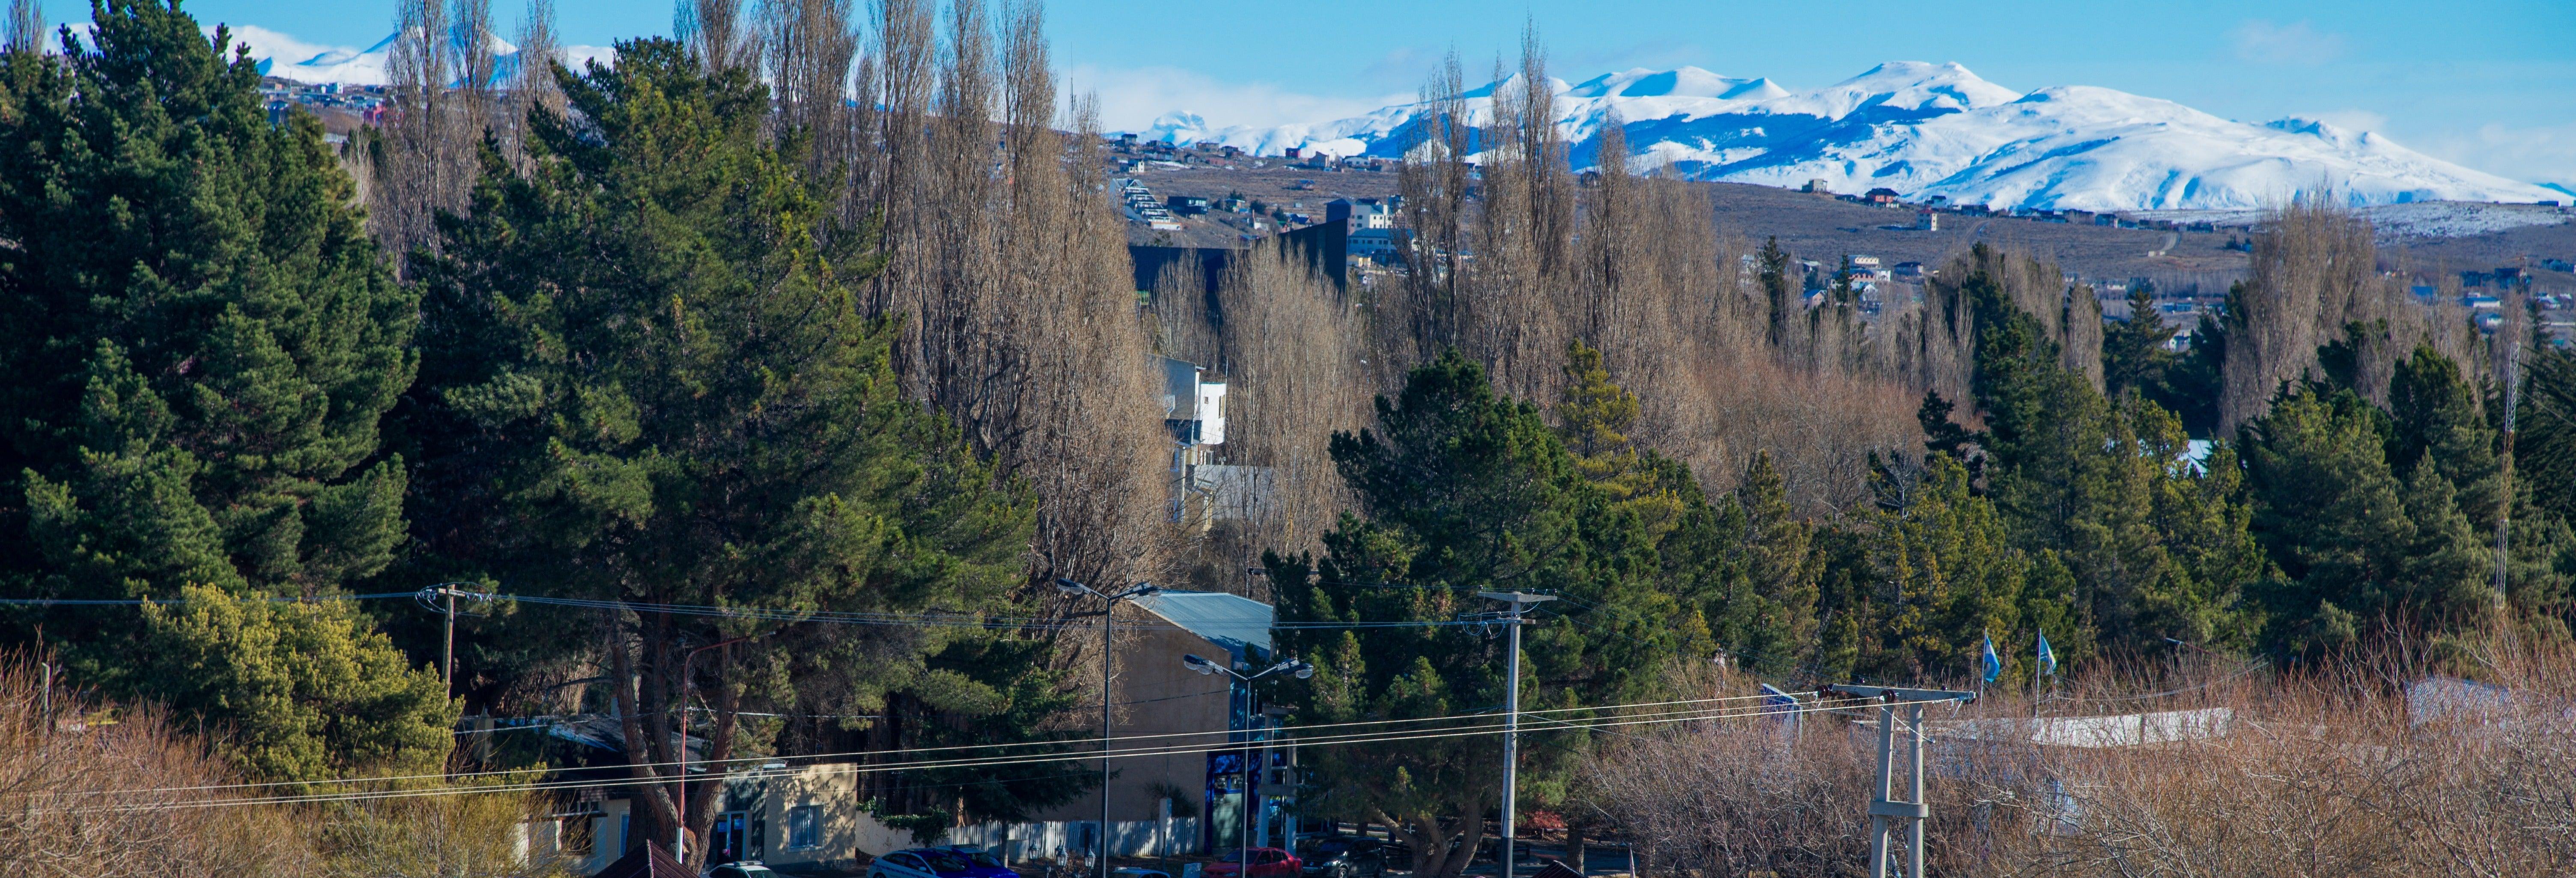 Tour del vino patagonico a El Calafate